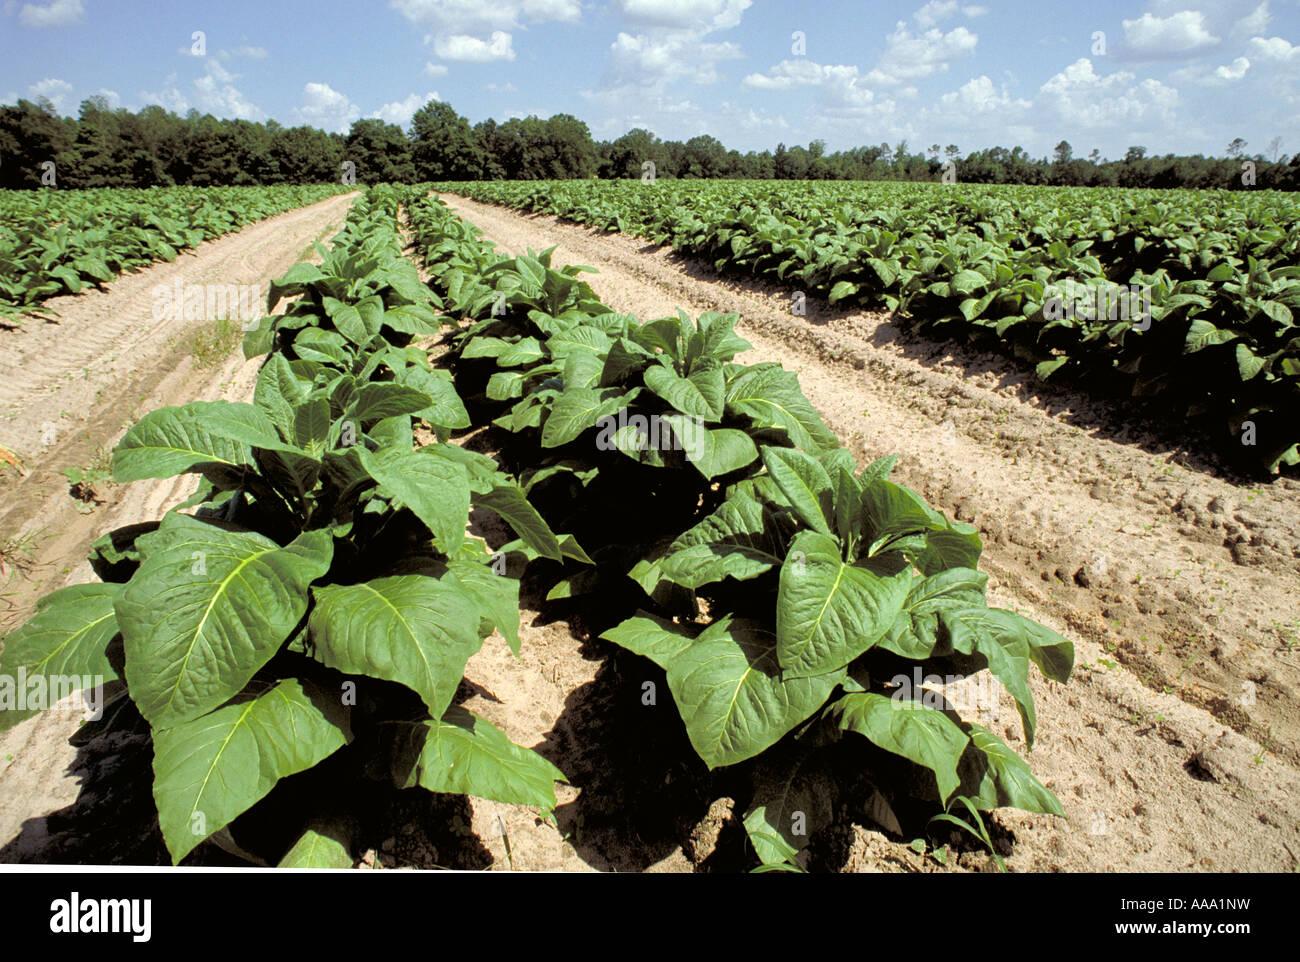 Elk218 2530 North Carolina Winston Salem tobacco field - Stock Image